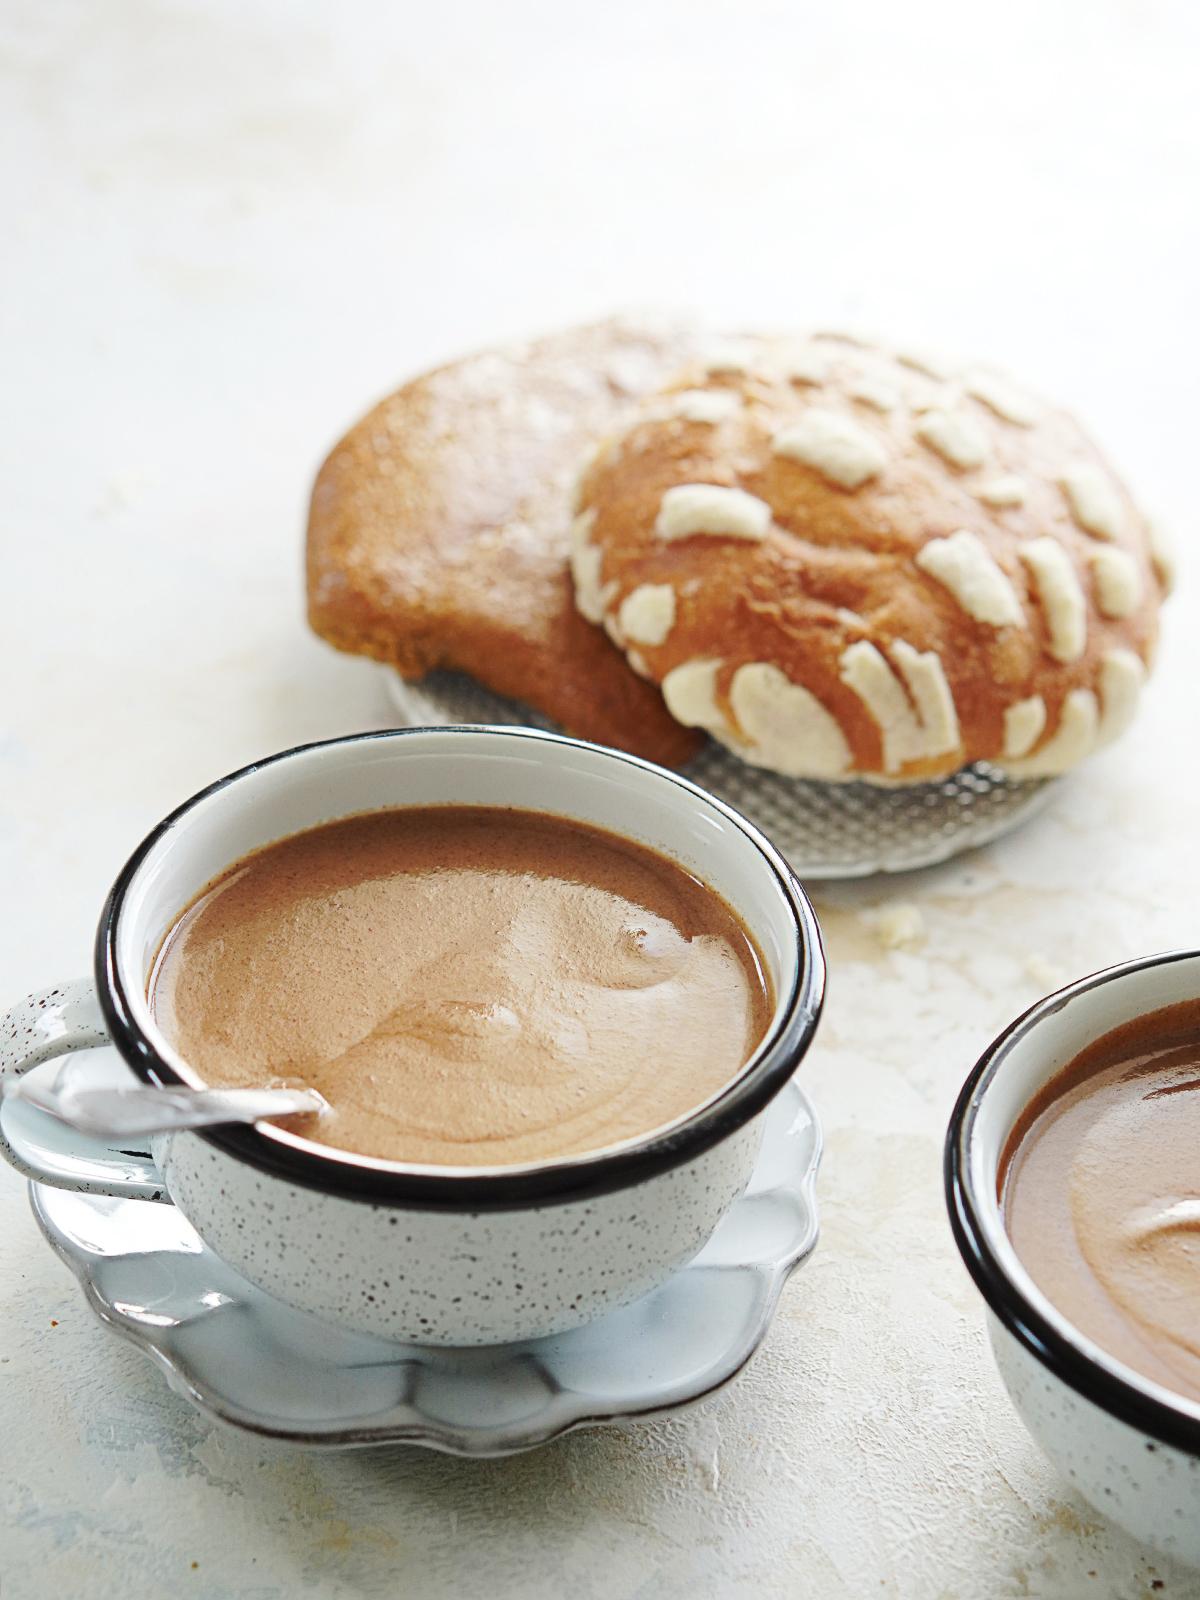 A mug with hot chocolate drink